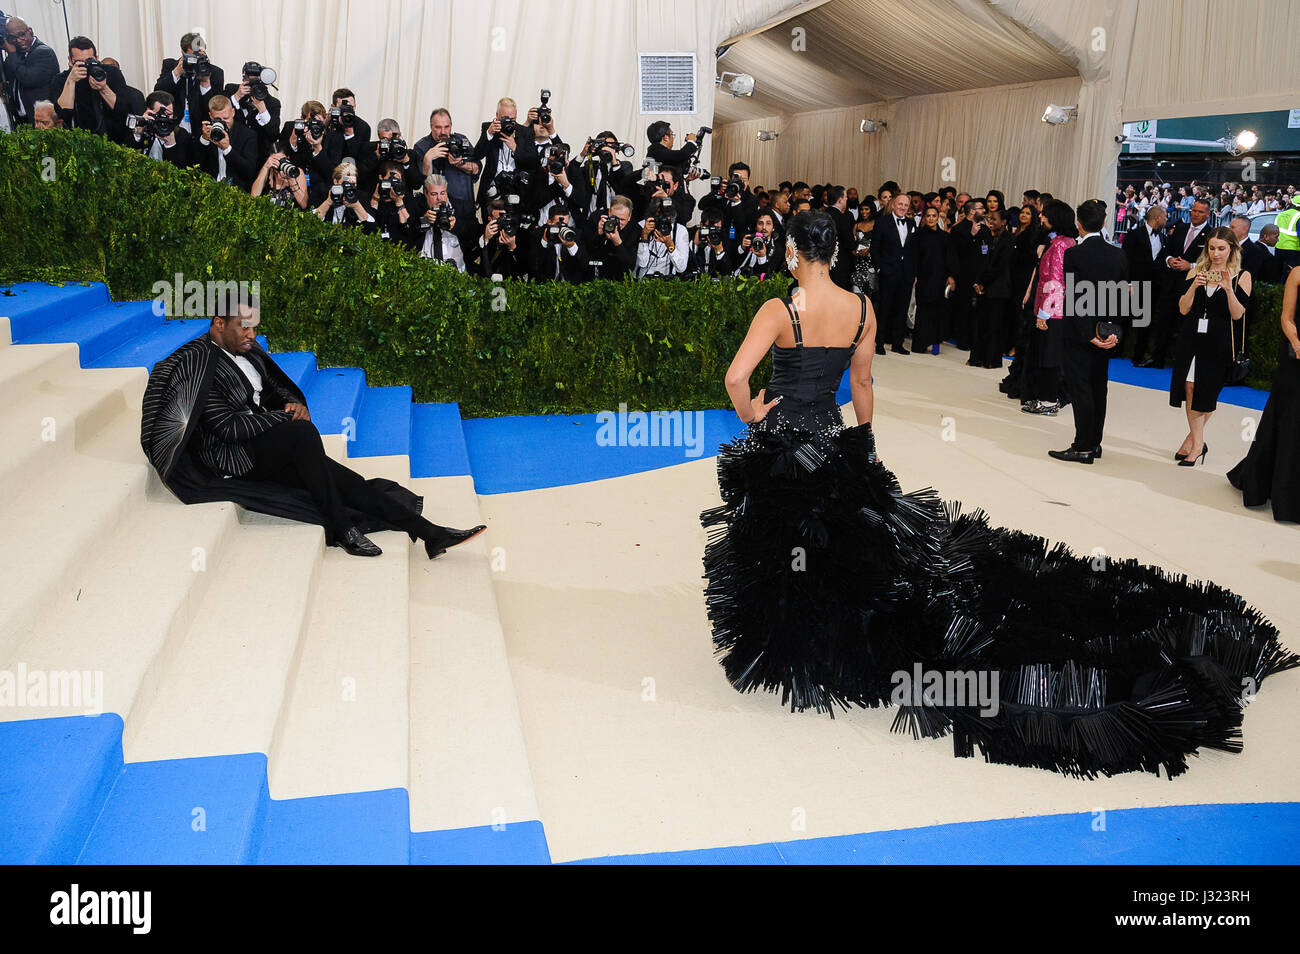 New York, NY, USA. 1er mai 2017. Sean Combs, Cassie Ventura. 2017 Metropolitan Museum of Art Costume Institute Gala Photo Stock